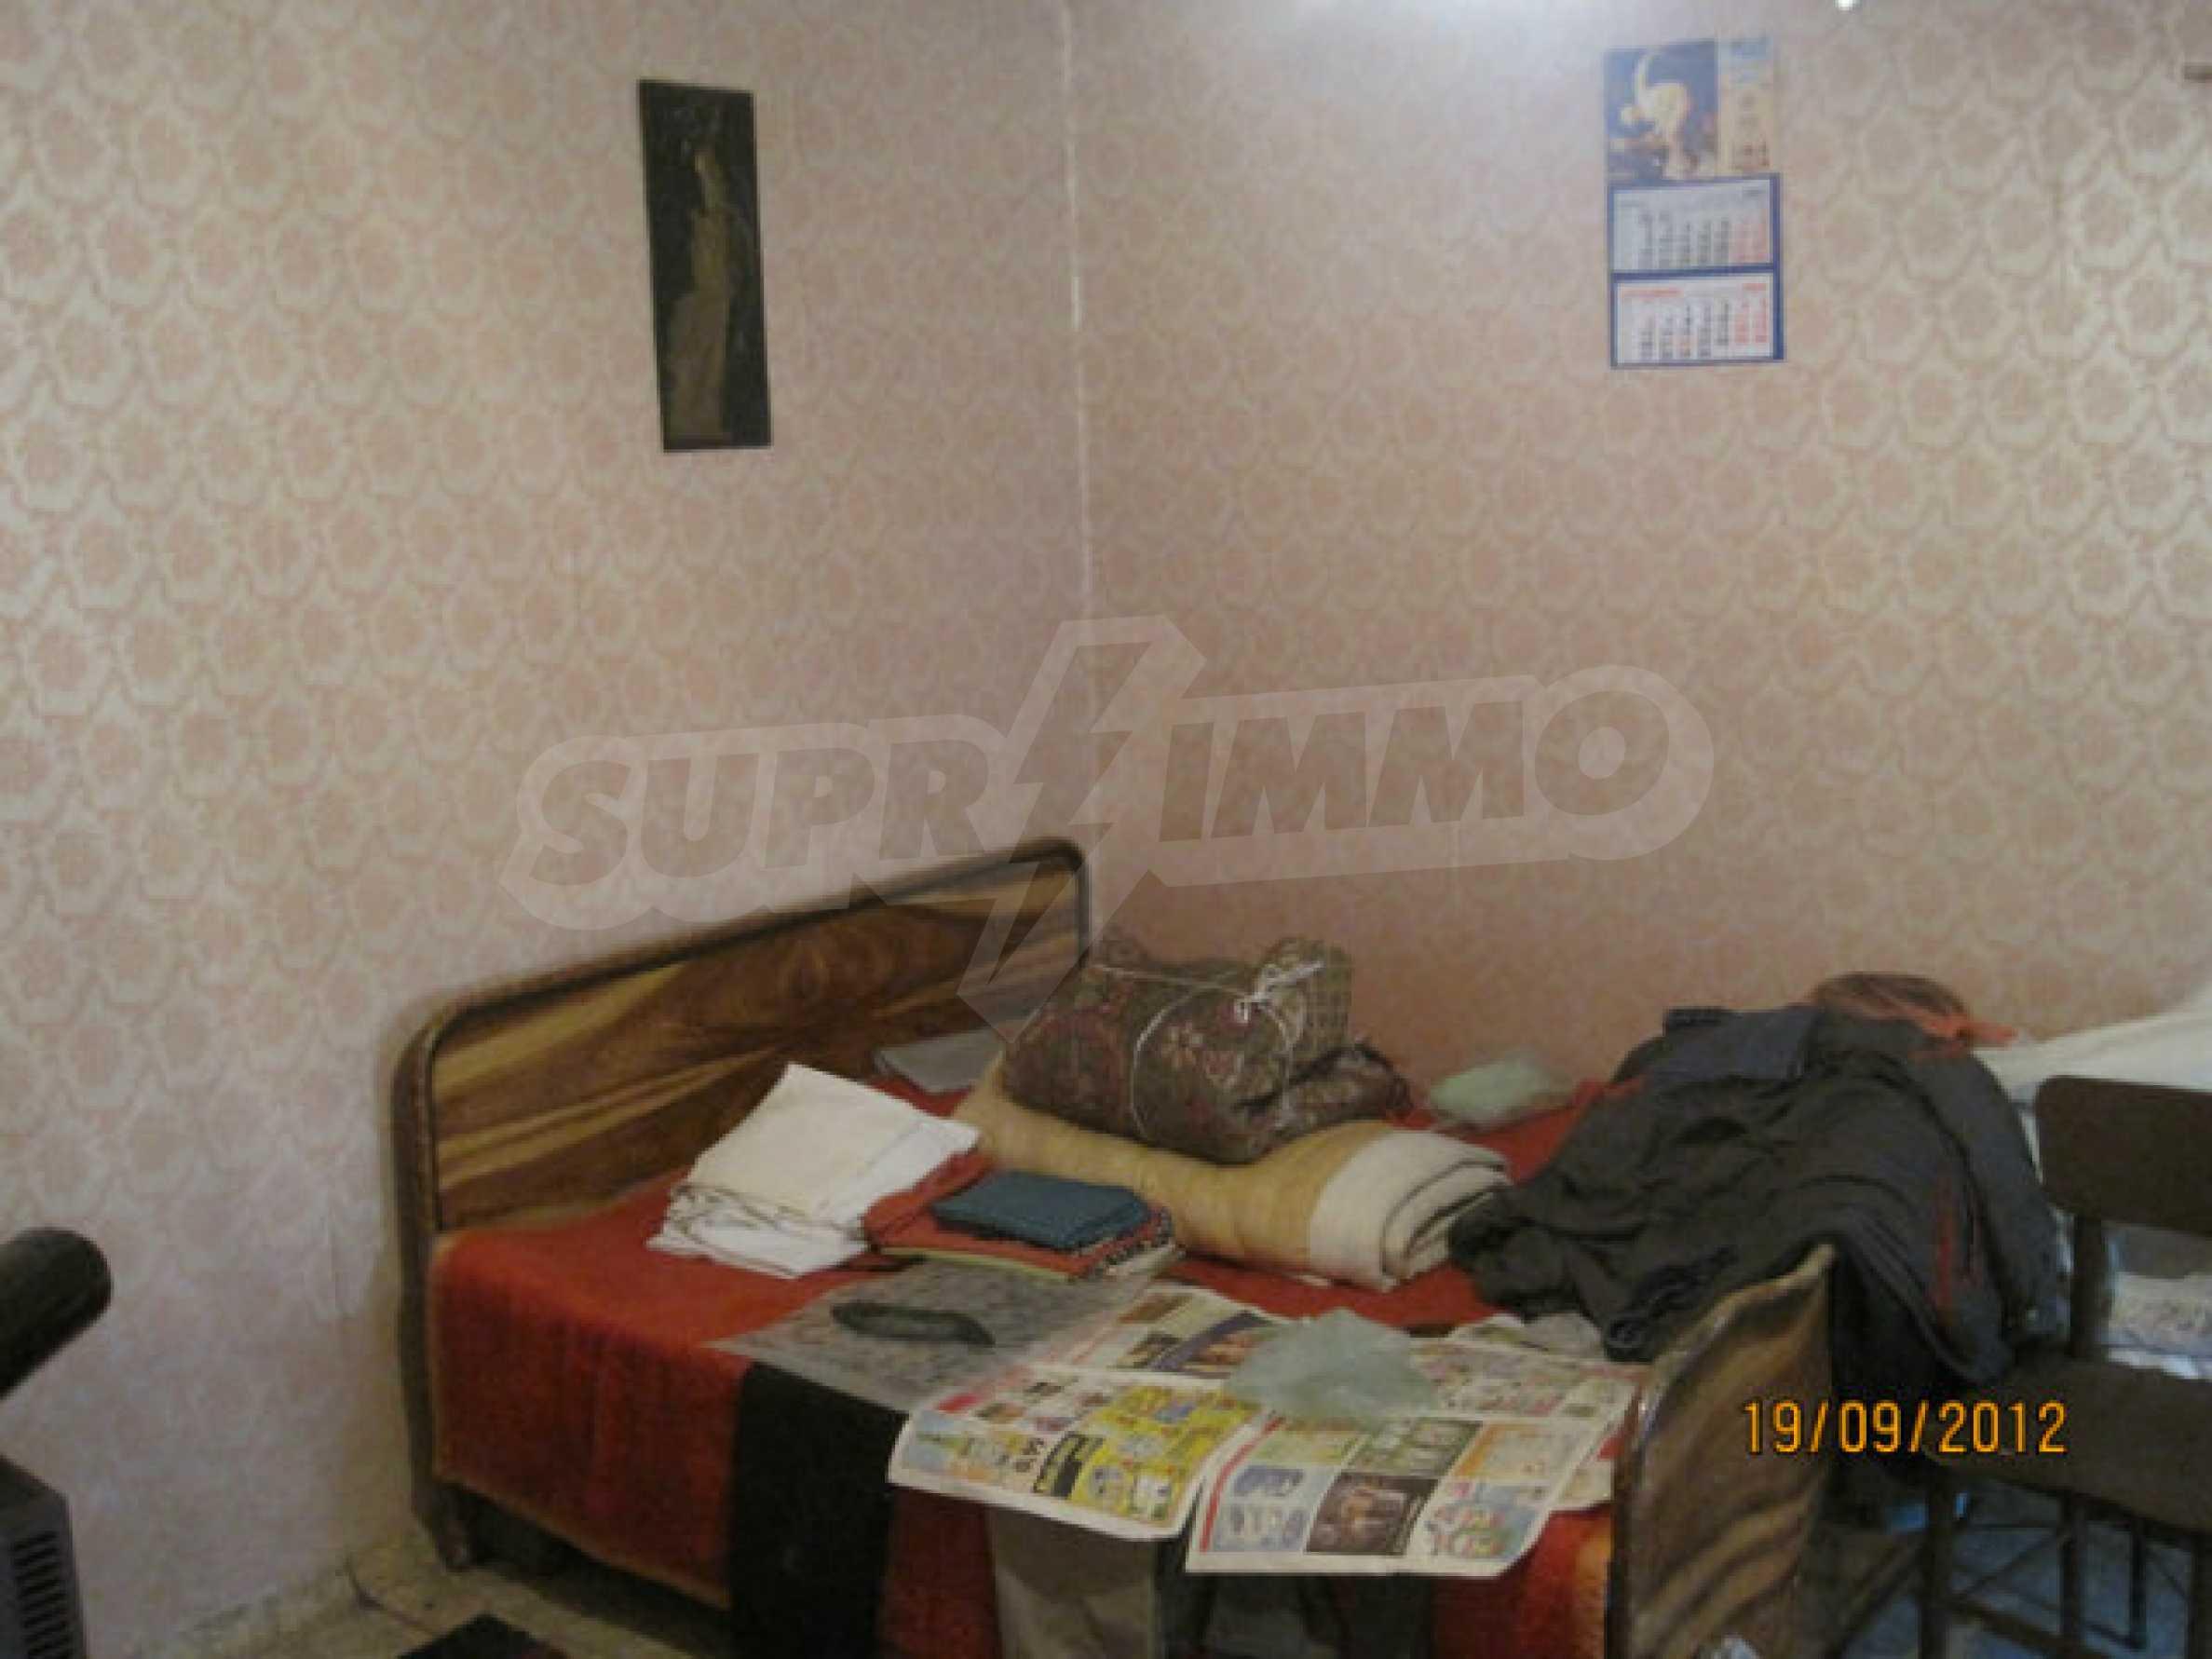 Detached house for sale in a quiet village near Dimitrovgrad 6